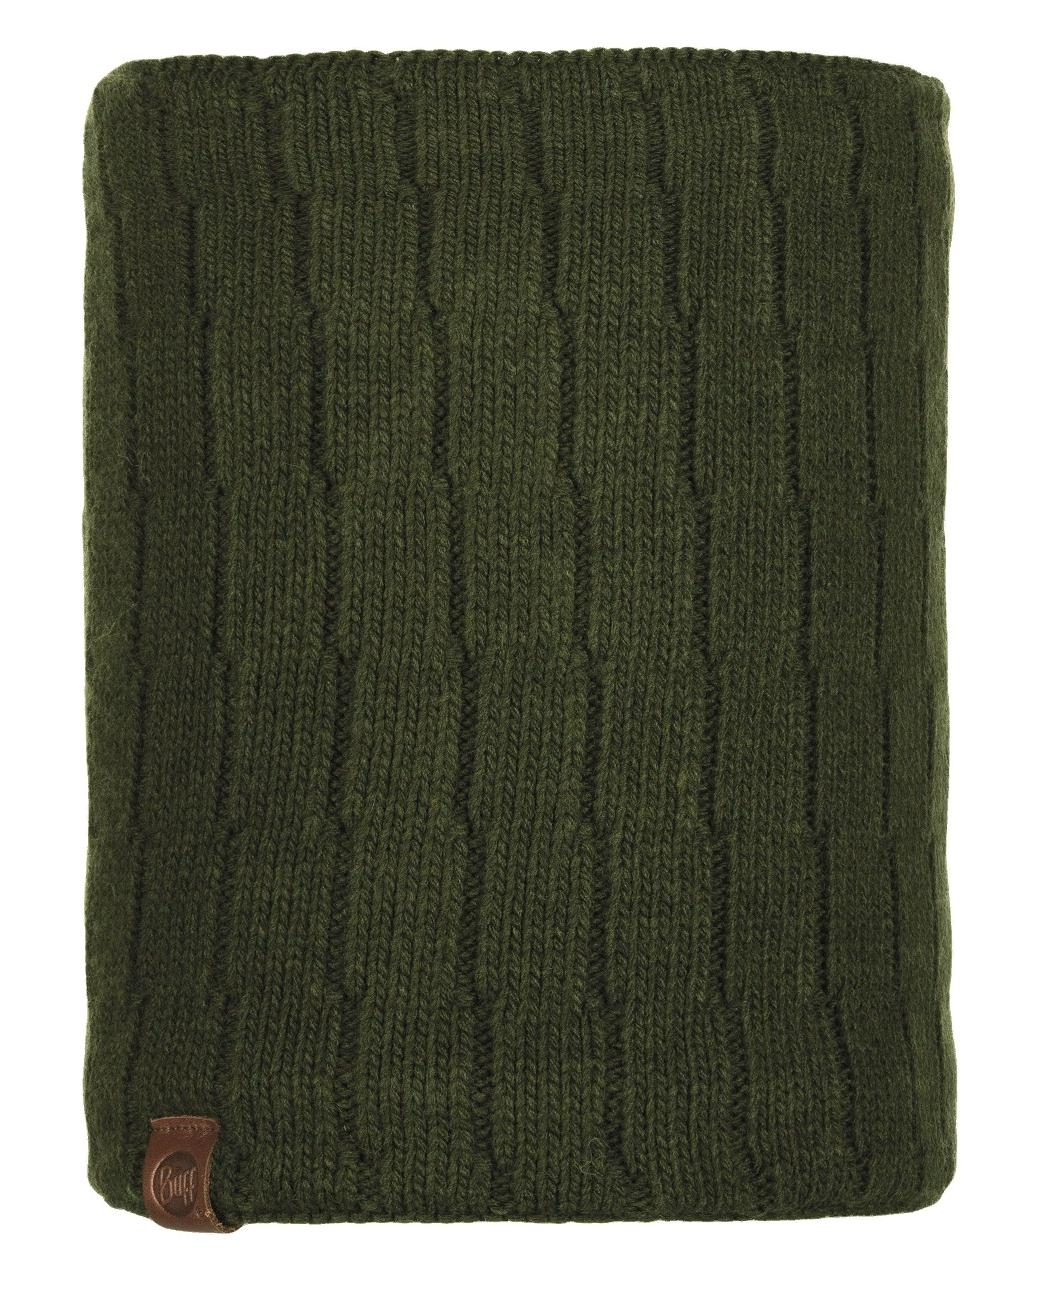 Шарф Buff Knitted & Polar Neckwarmer Jeroen Military